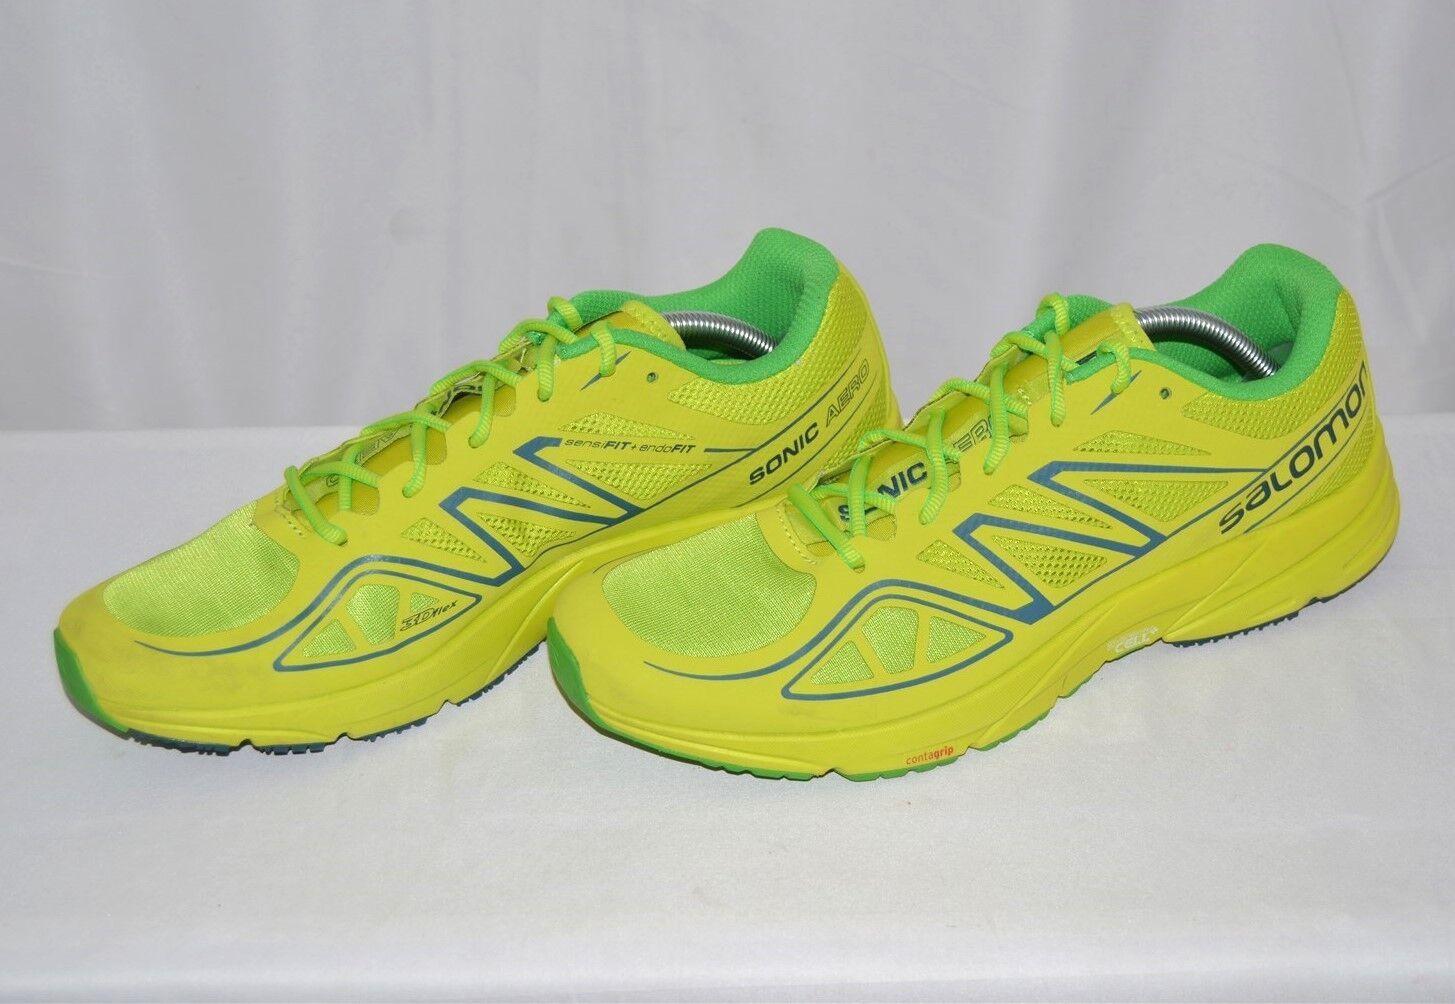 Salomon Men's Sonic Aero Running shoes, Men's 11, 393495 Pre-Owned